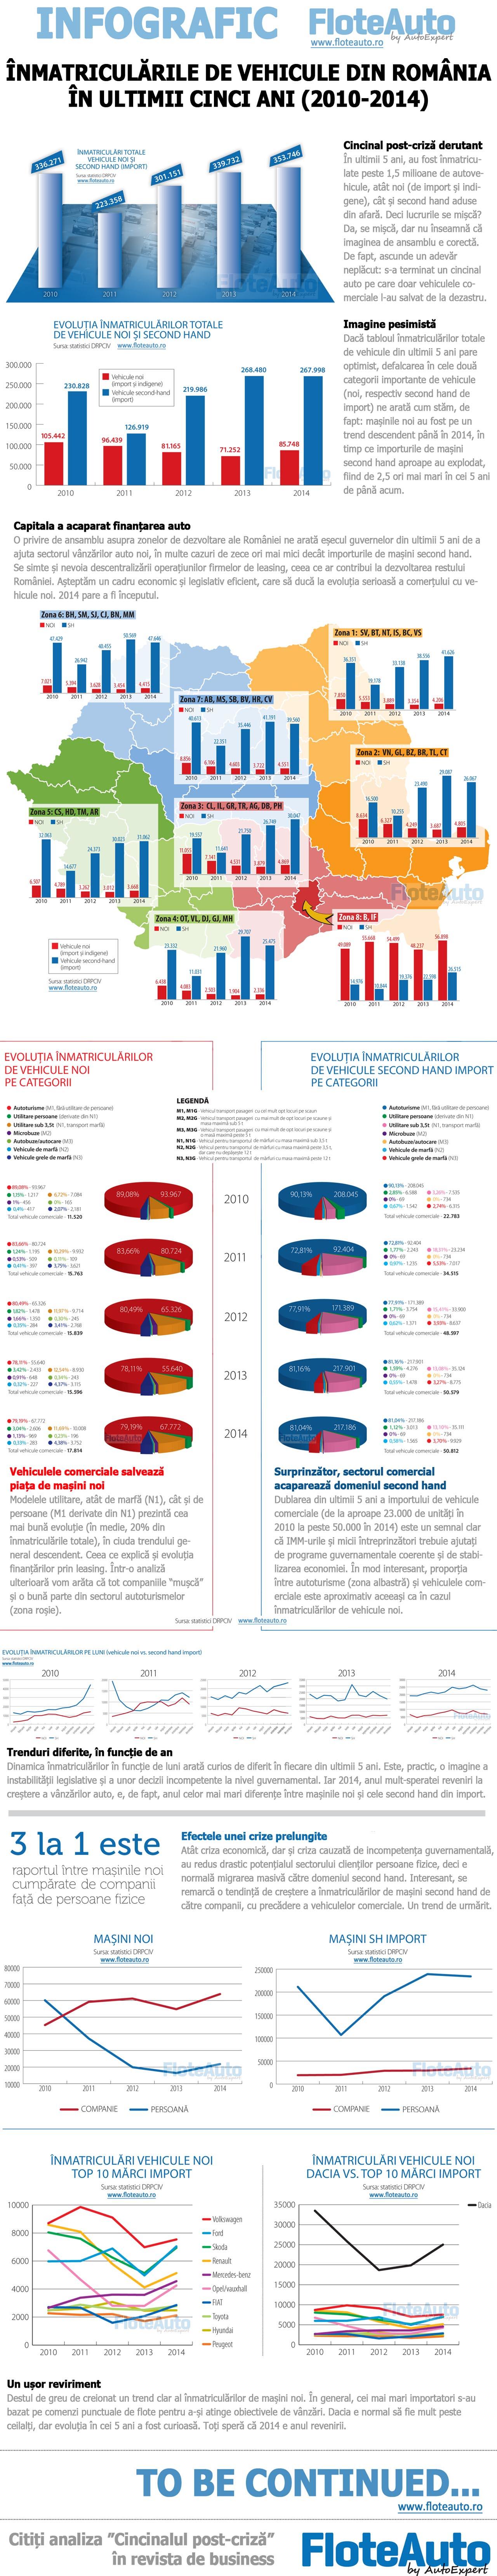 infografic inmatriculari 5 ani - floteauto cu logo 1